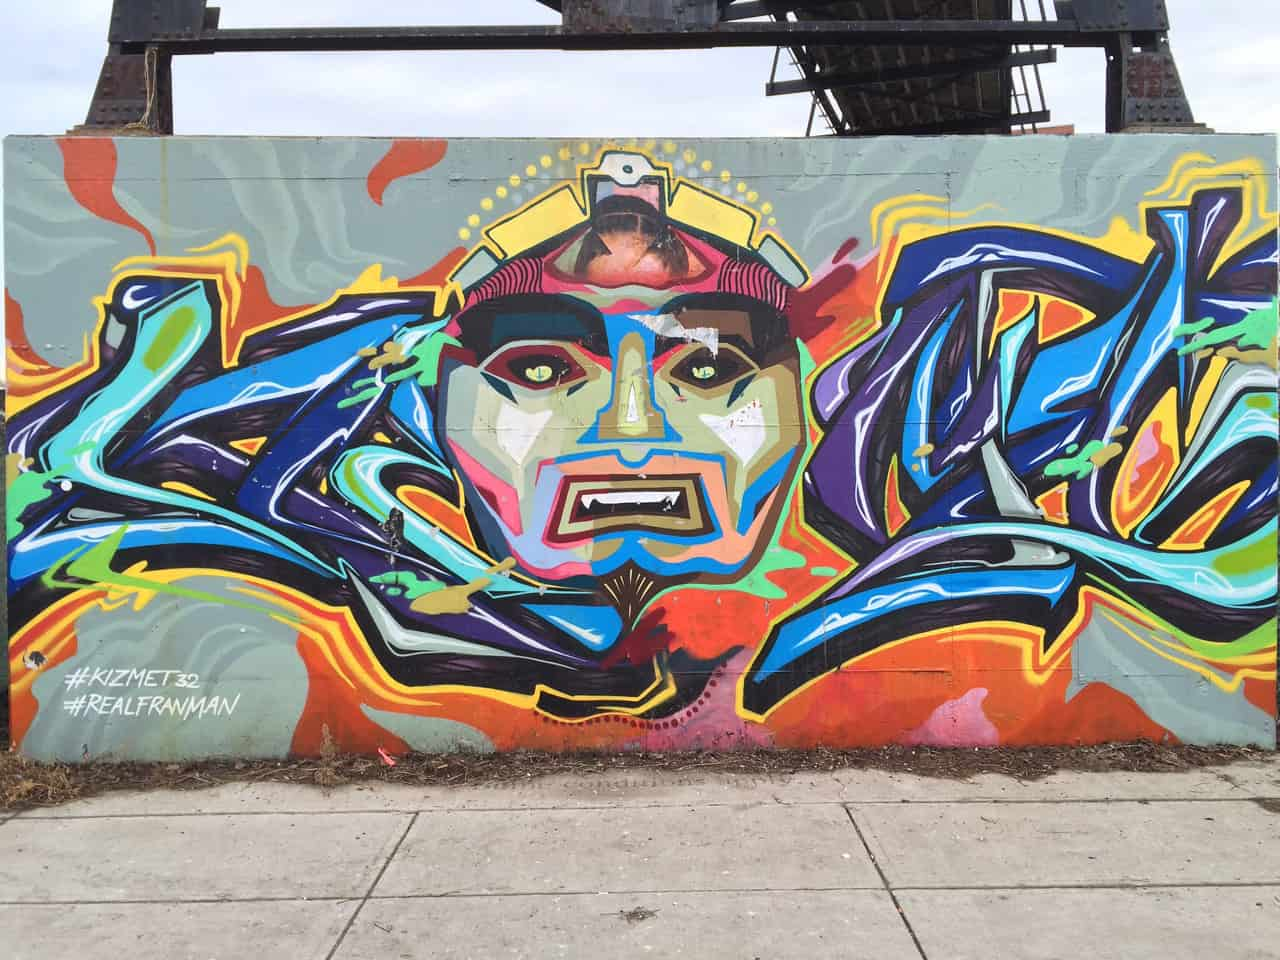 graffiti in the junction